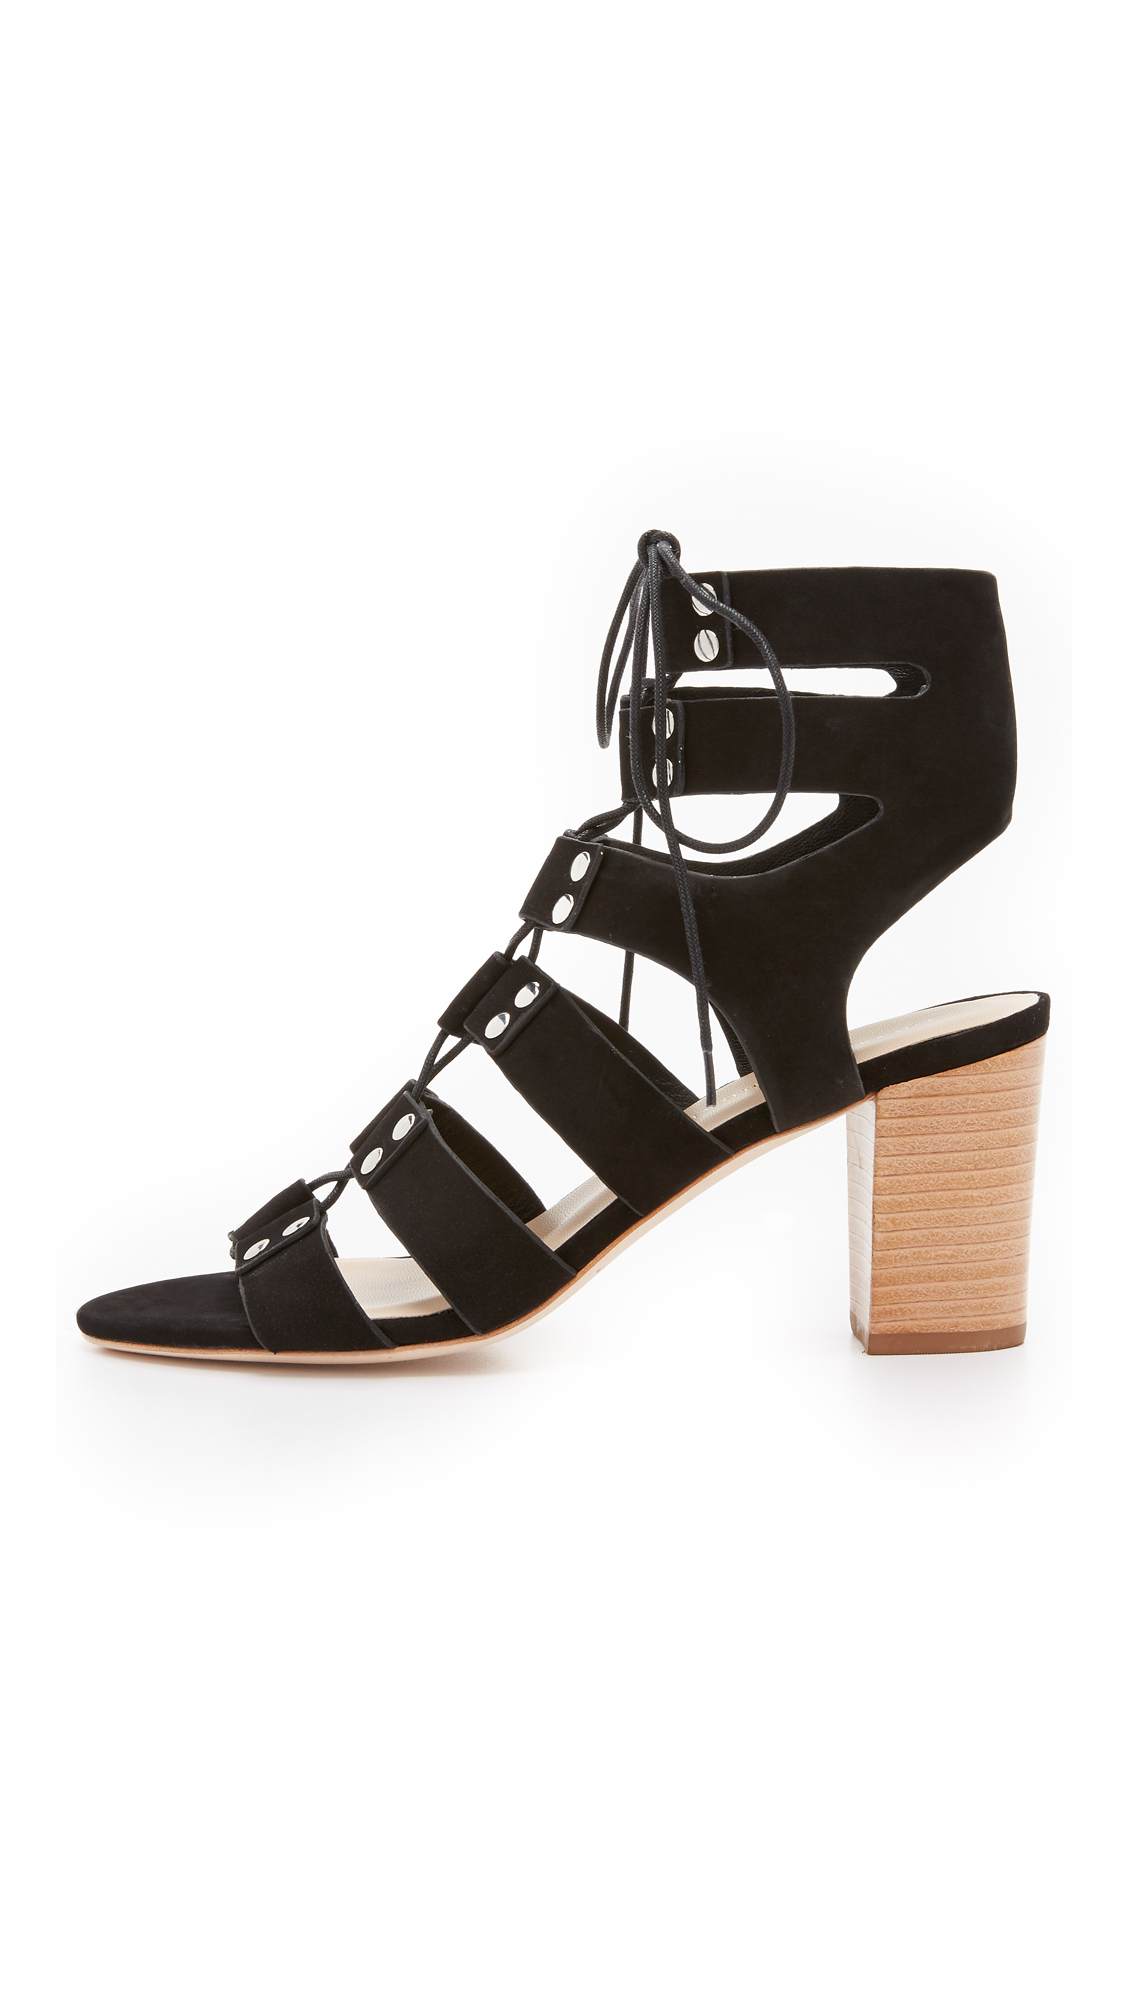 bdbb72cc9e4b Loeffler Randall Hana City Sandals